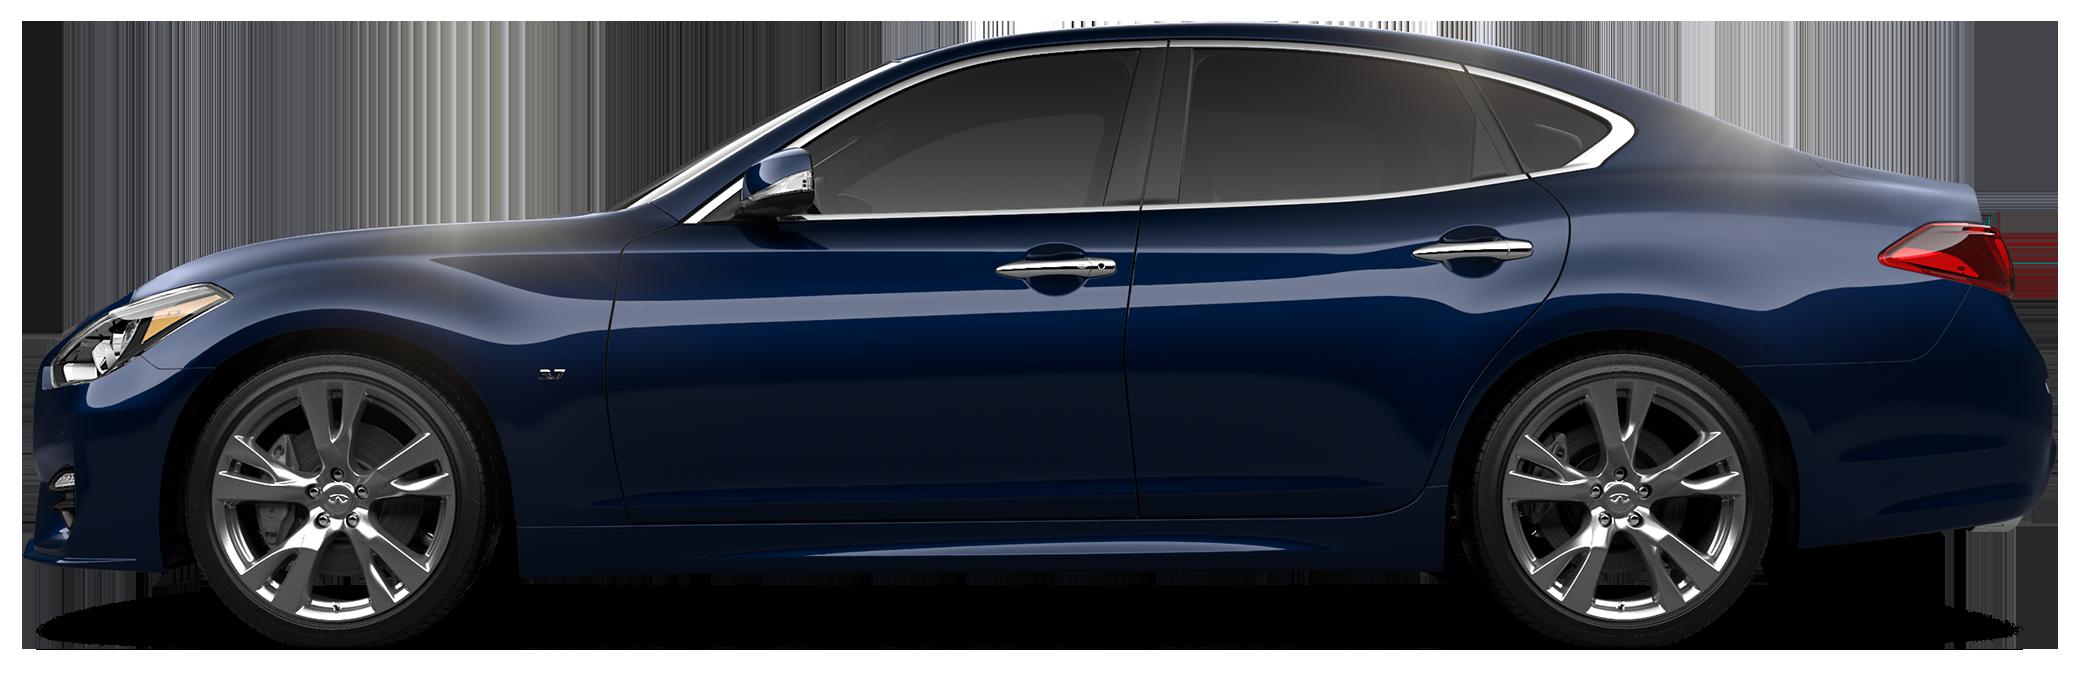 2019 INFINITI Q70 Sedan 5.6 LUXE